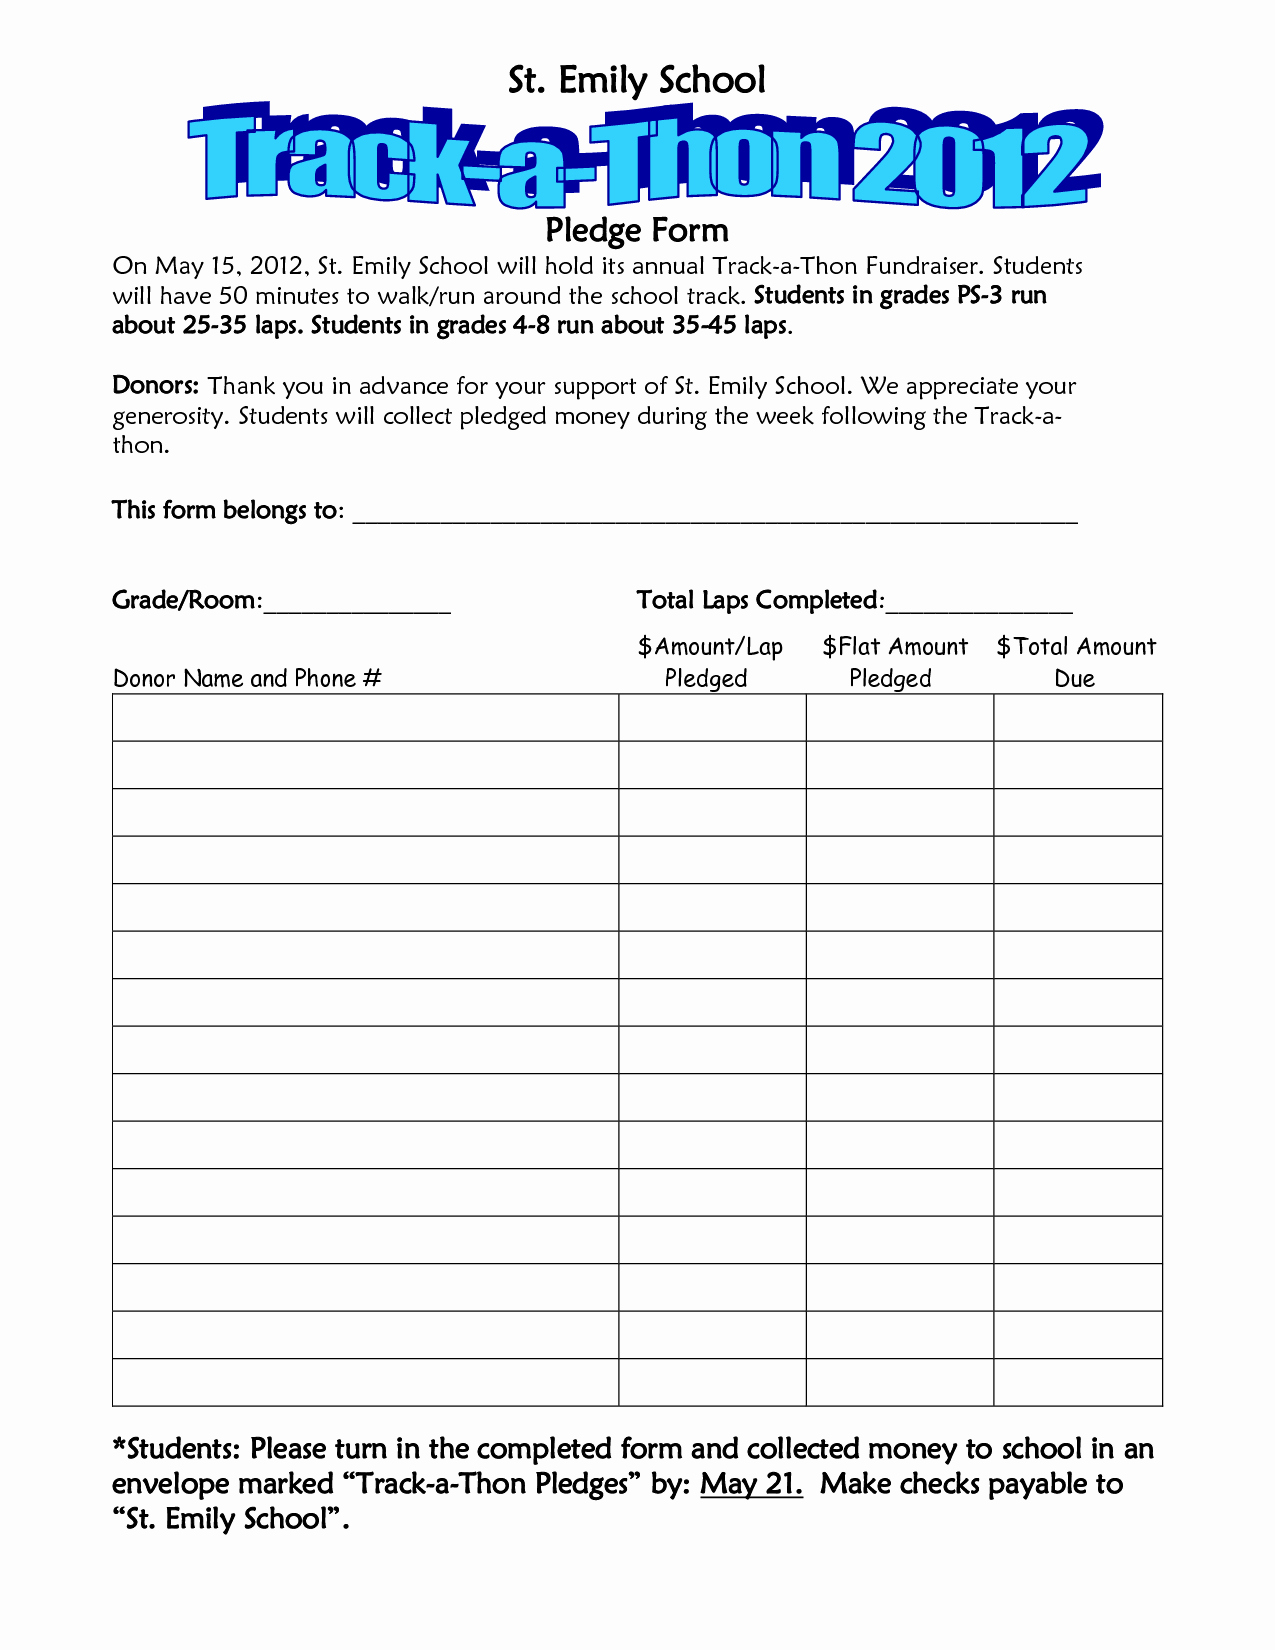 Pledge Card Template Word Elegant Walkathon Pledge form Template Invitation Templates